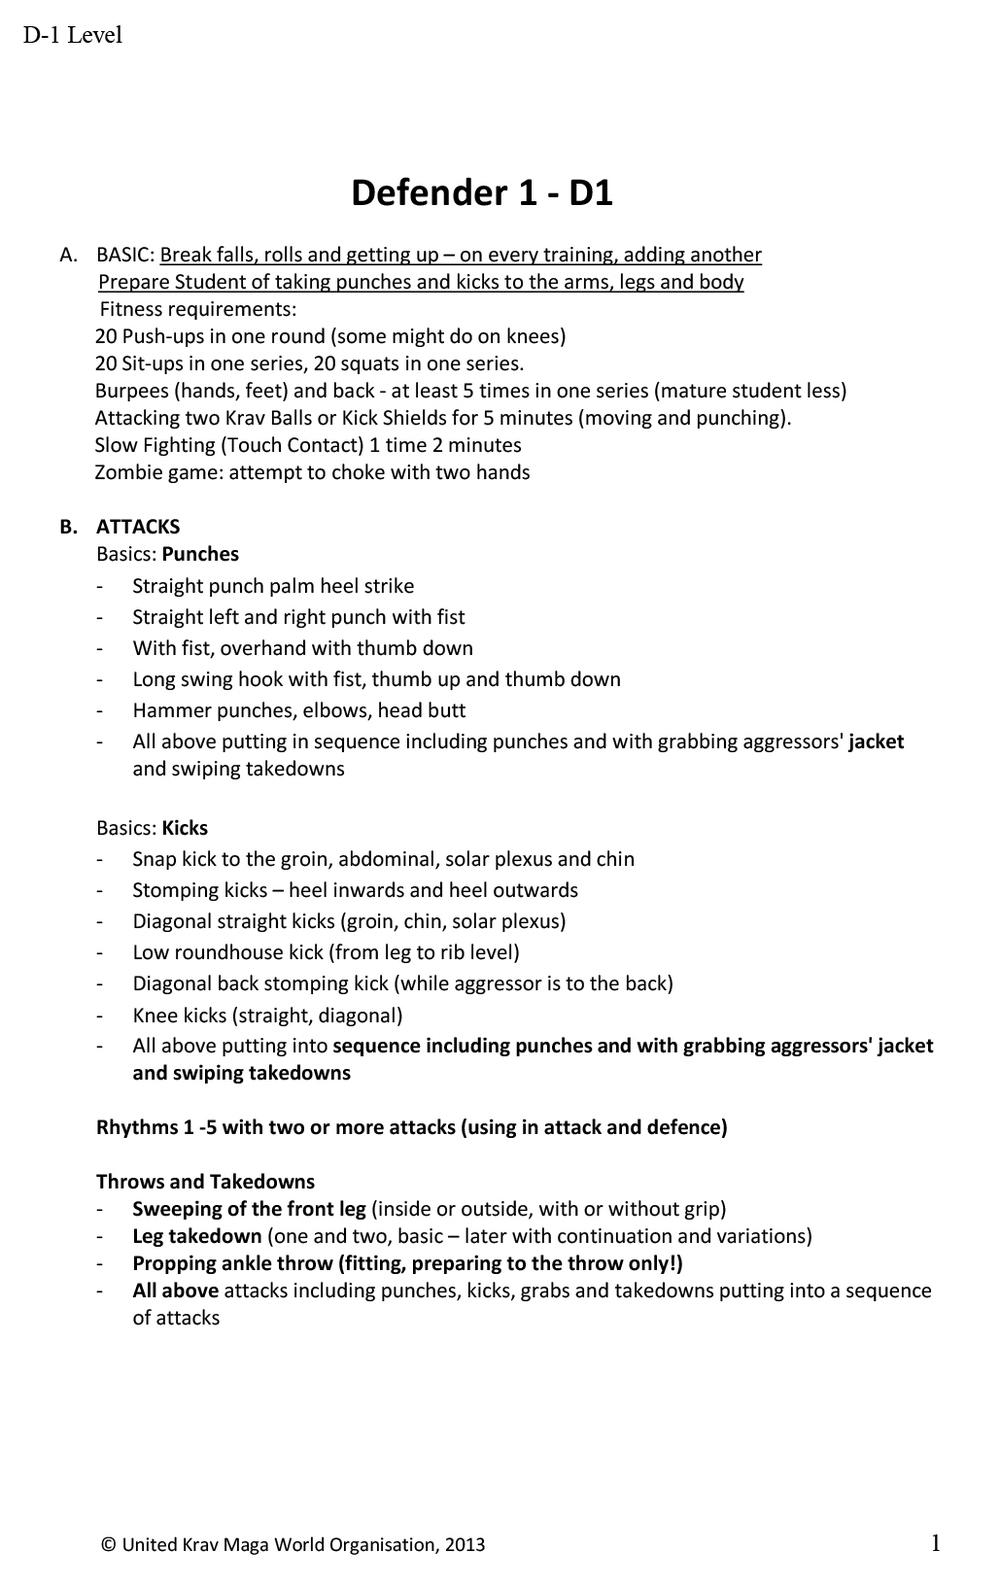 D1_ENGLISH.pdf-1.jpg